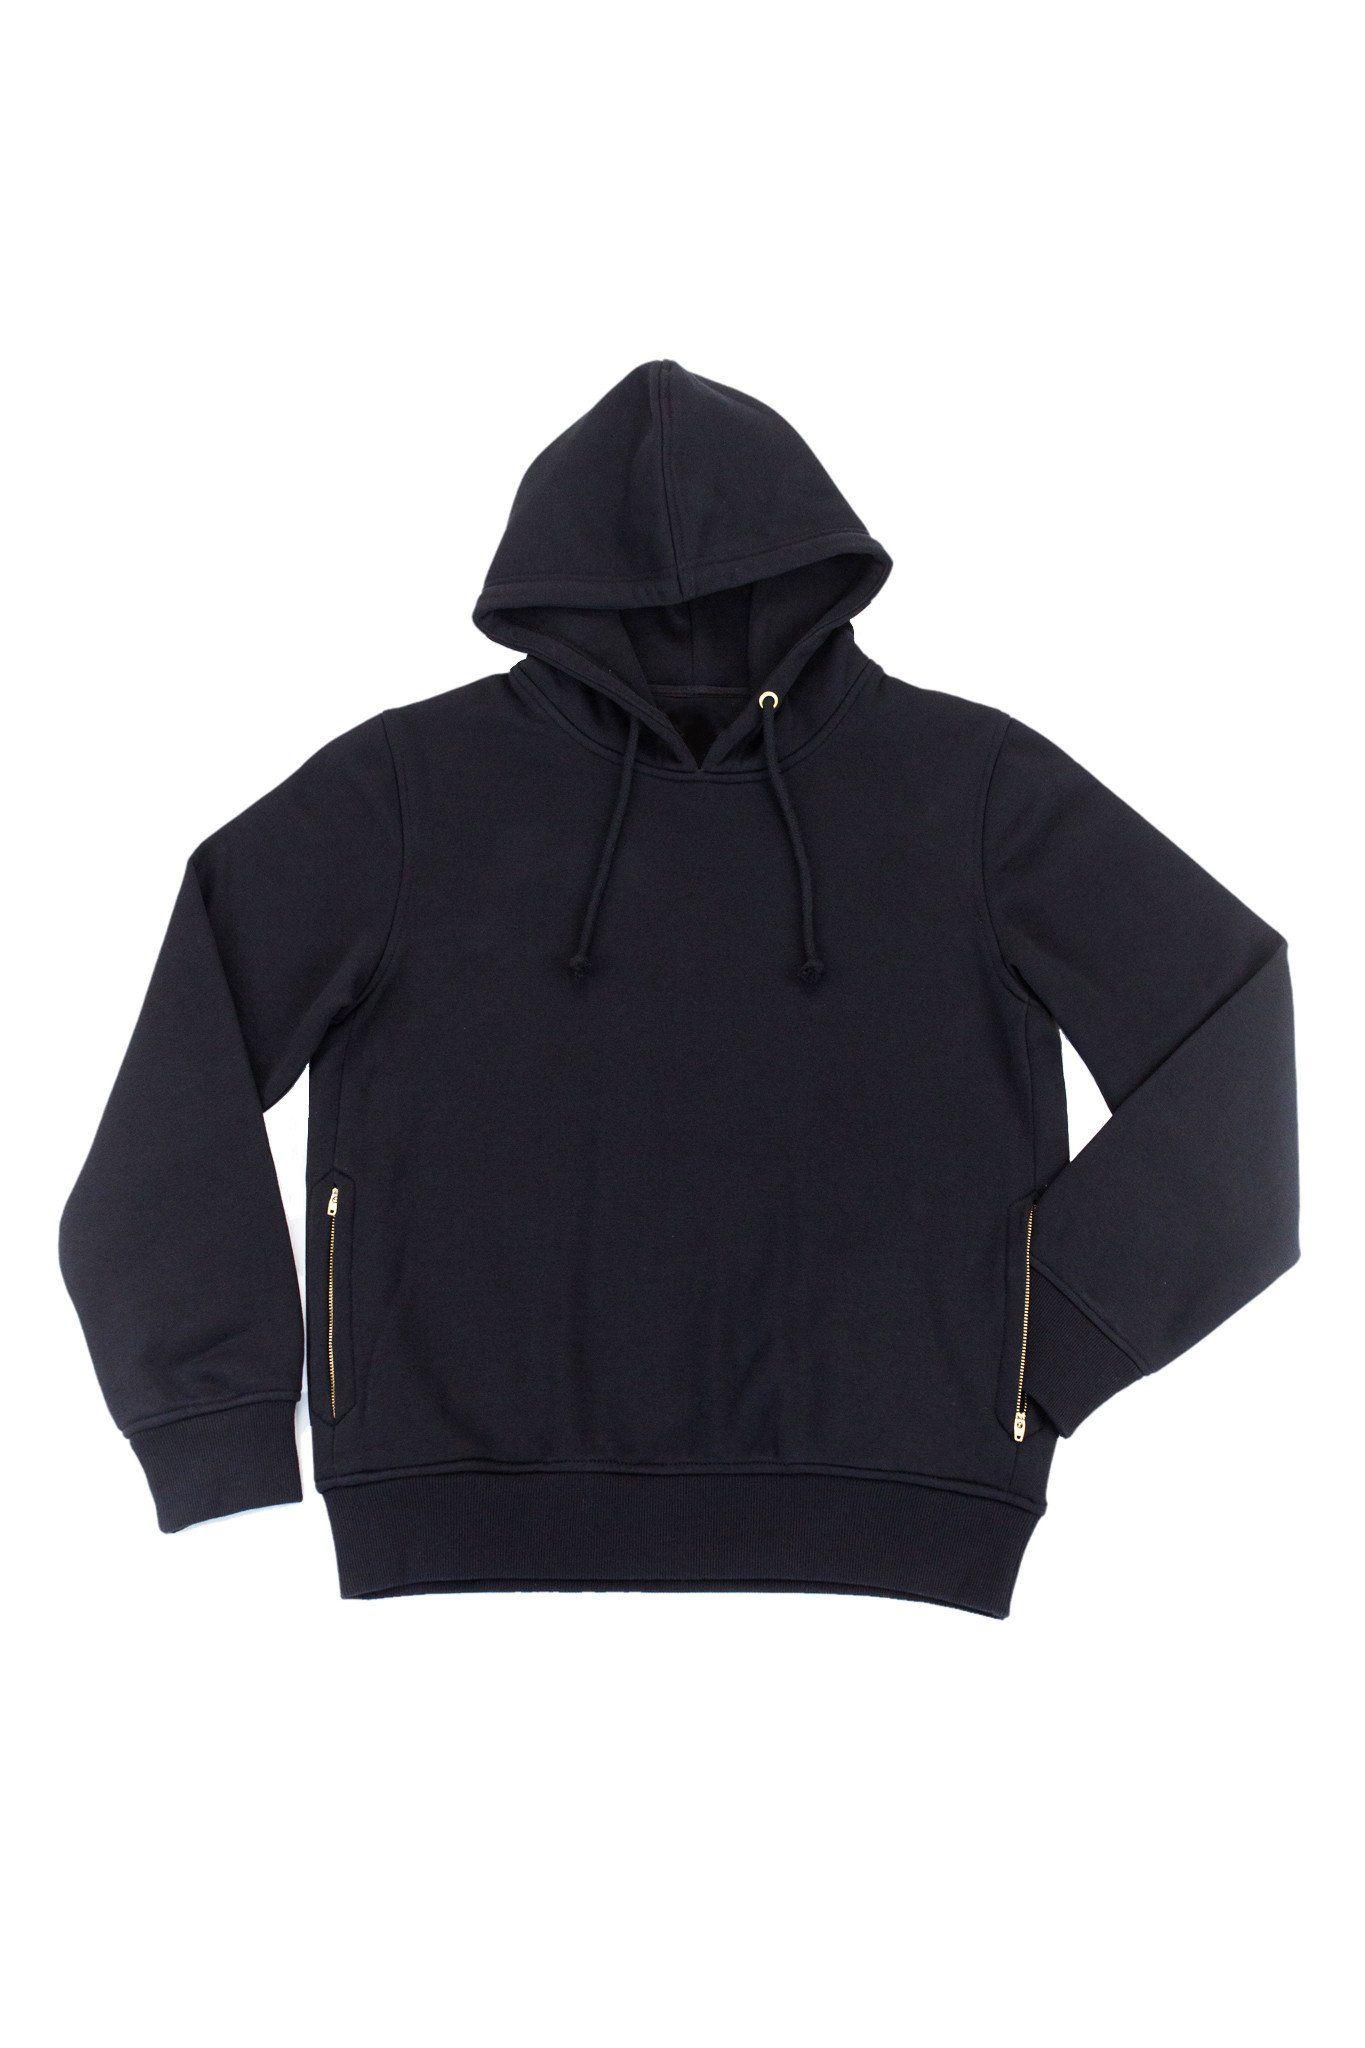 Men Black Pullover Hoodie With Side Zip Pockets Long Sleeve Plain And Cotton Fleece Hooded Sweatshirts Stylish Hoodies Womens Fashion Hoodies Unisex Hoodies [ 2048 x 1365 Pixel ]